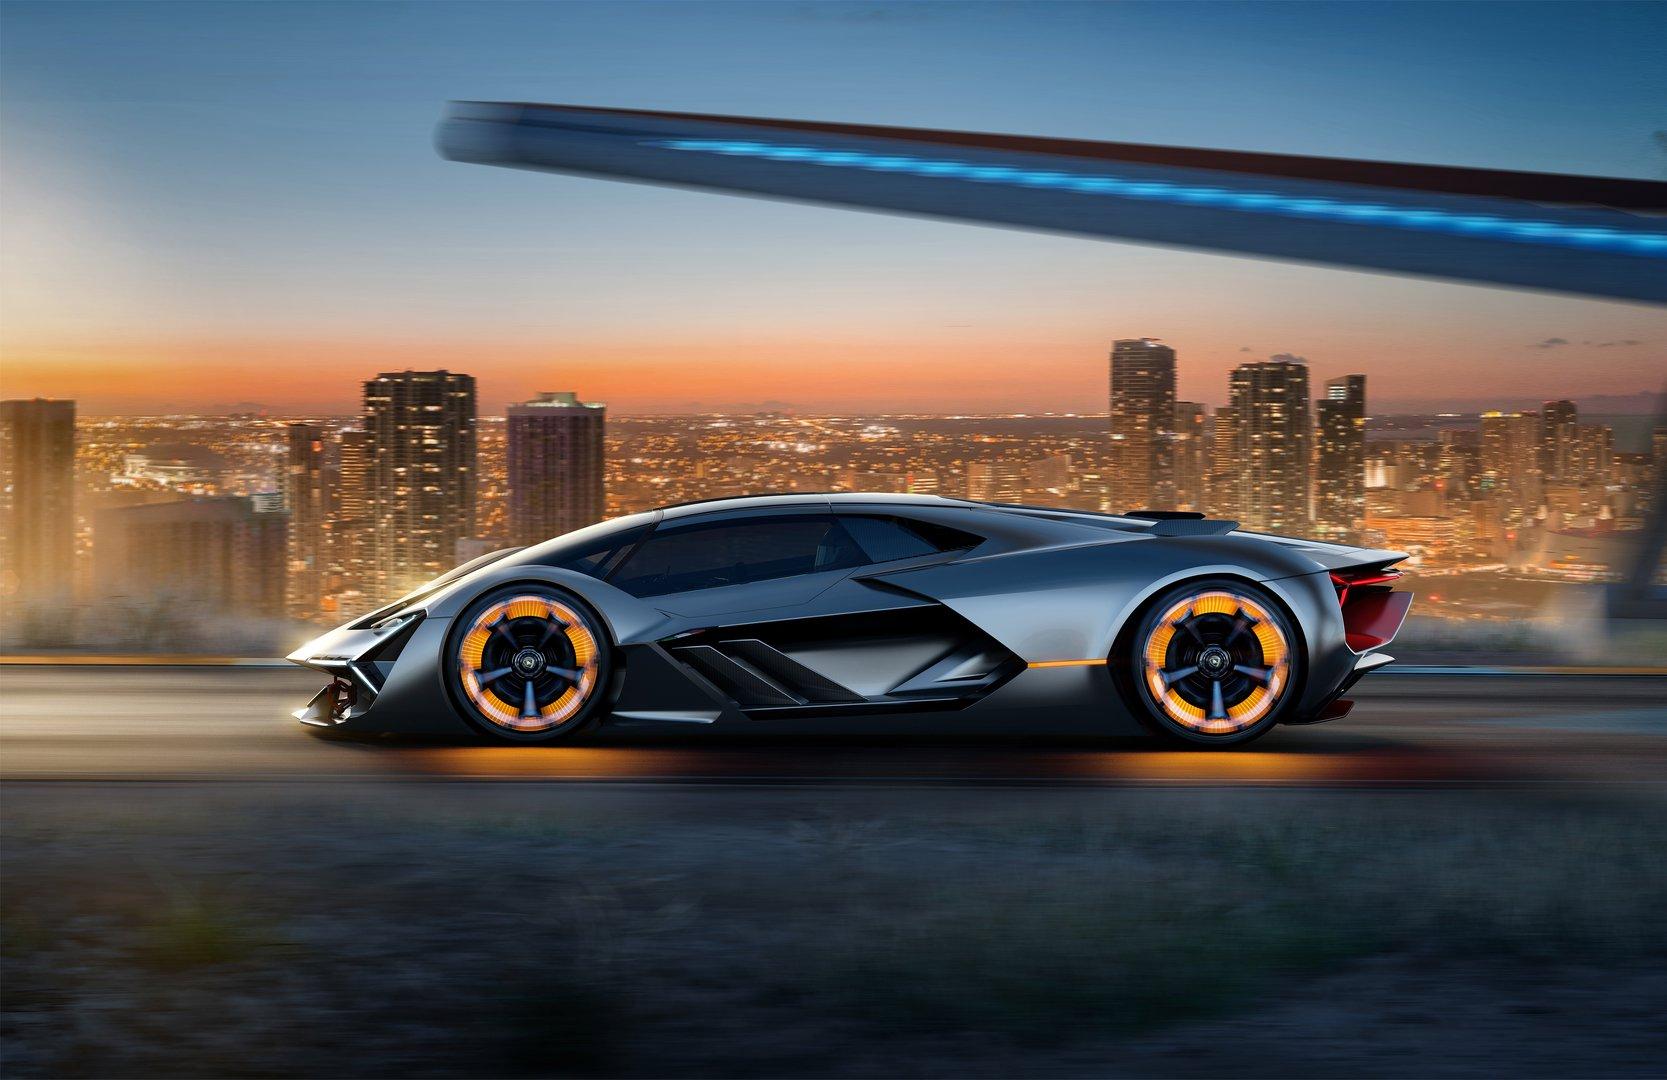 Lamborghini introduces electric supercar – unfortunately just as on mini cooper gt vision, aston martin gt vision, toyota gt vision, mazda gt vision, jeep gt vision, mercedes gt vision, mitsubishi gt vision, renault alpine gt vision, volkswagen gt vision, dodge gt vision, nissan gt vision, bmw gt vision,